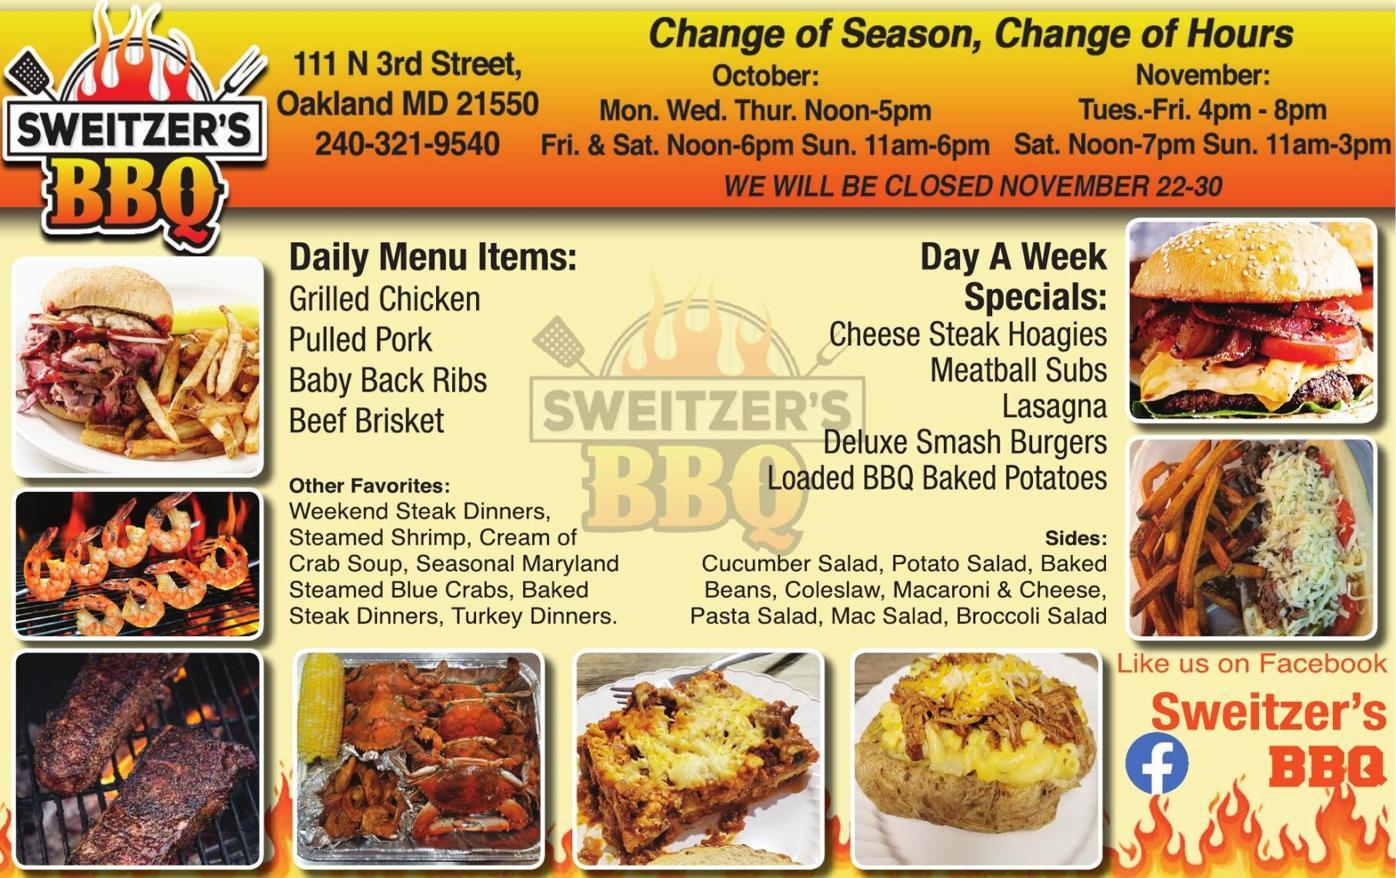 SWEITZER'S BBQ LLC